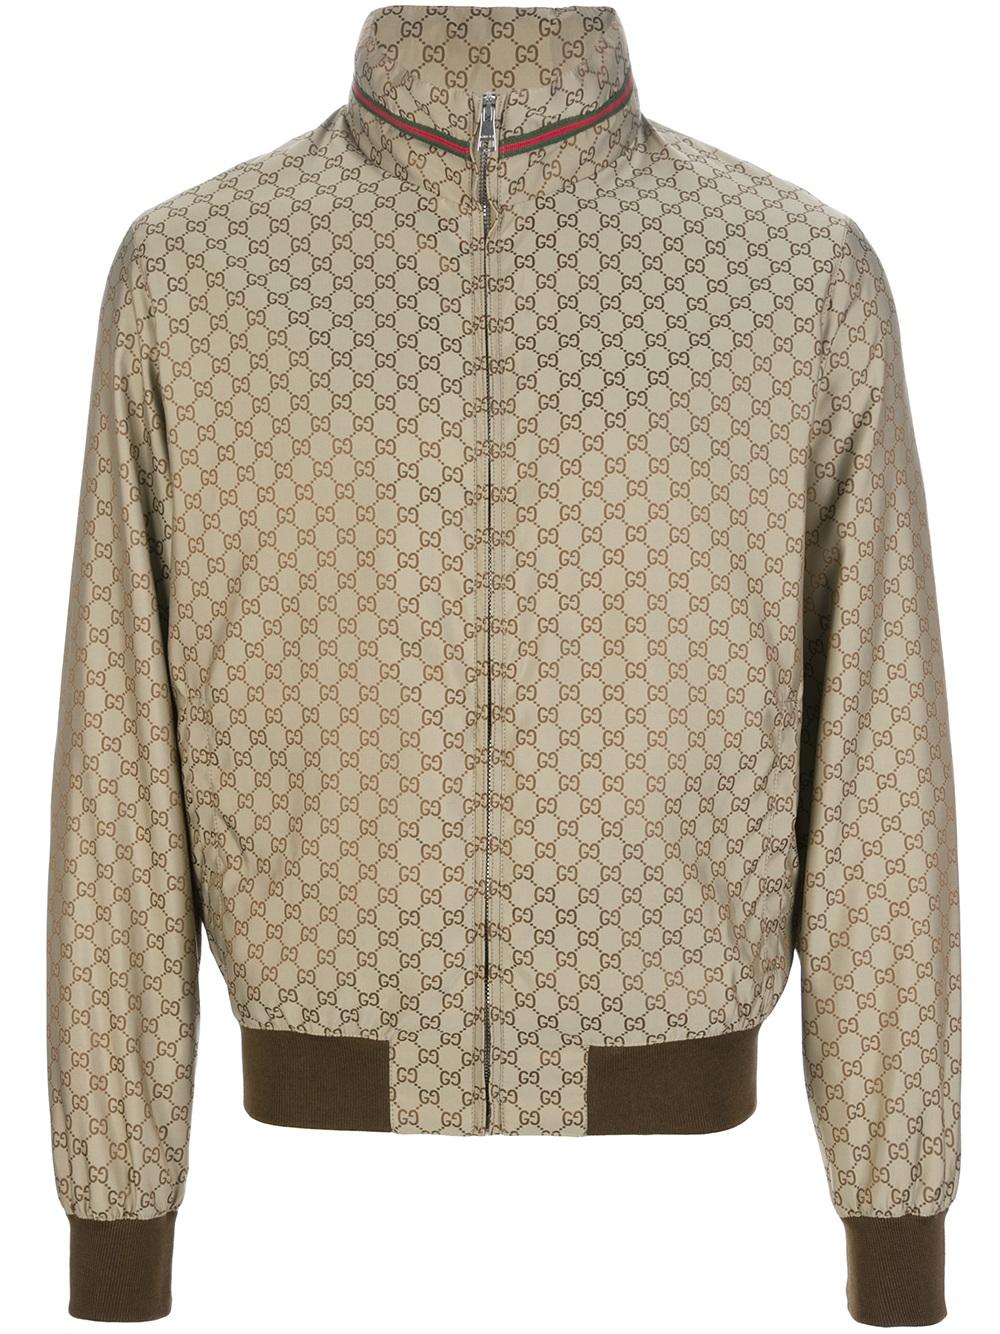 Gucci Logo Print Bomber Jacket In Metallic For Men Lyst